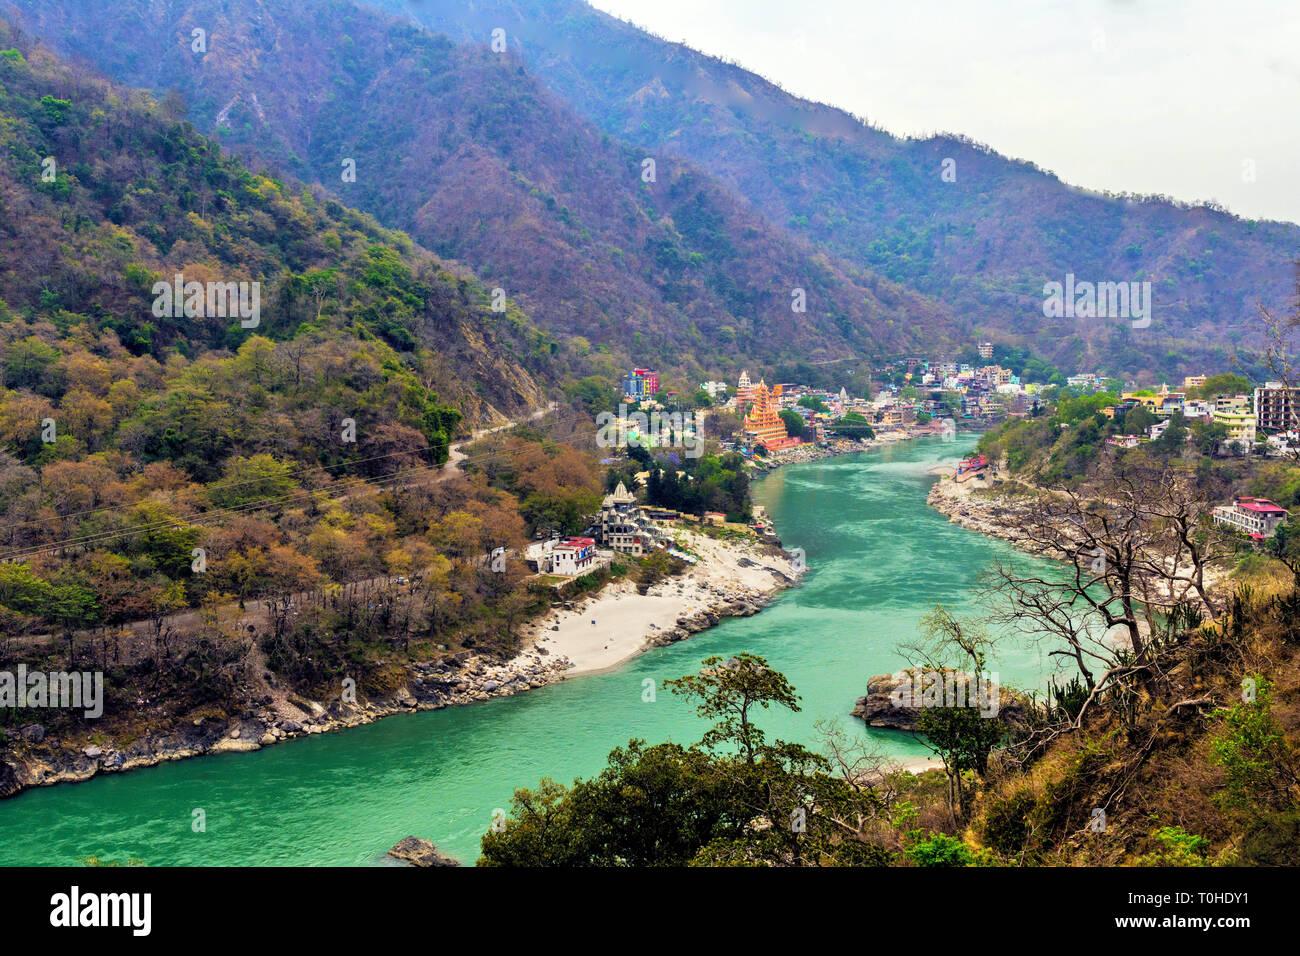 El río Ganga, Rishikesh, Uttarakhand, India, Asia Imagen De Stock